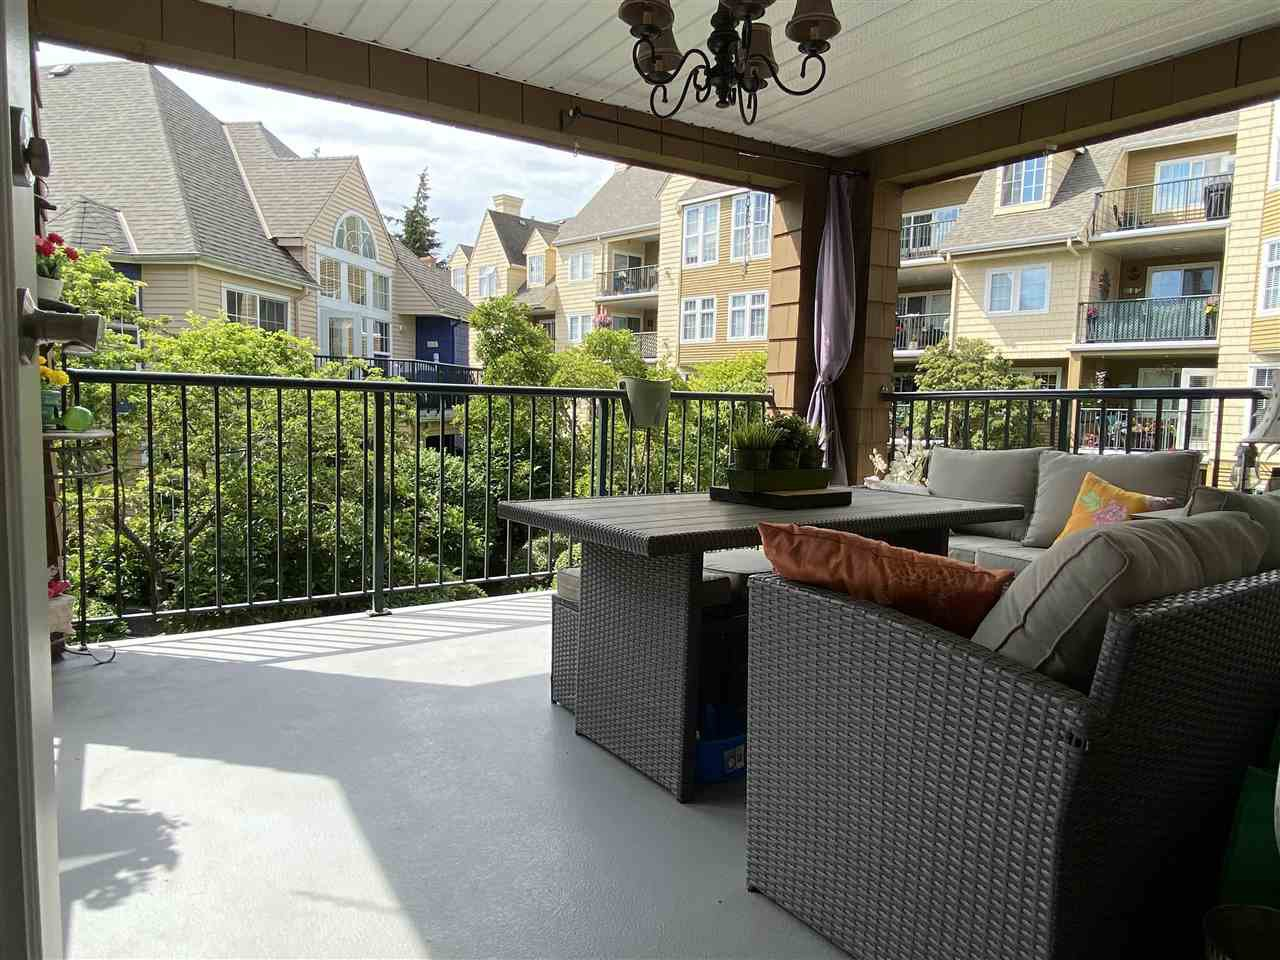 Photo 2: Photos: 304 1369 56 STREET in Delta: Cliff Drive Condo for sale (Tsawwassen)  : MLS®# R2464890